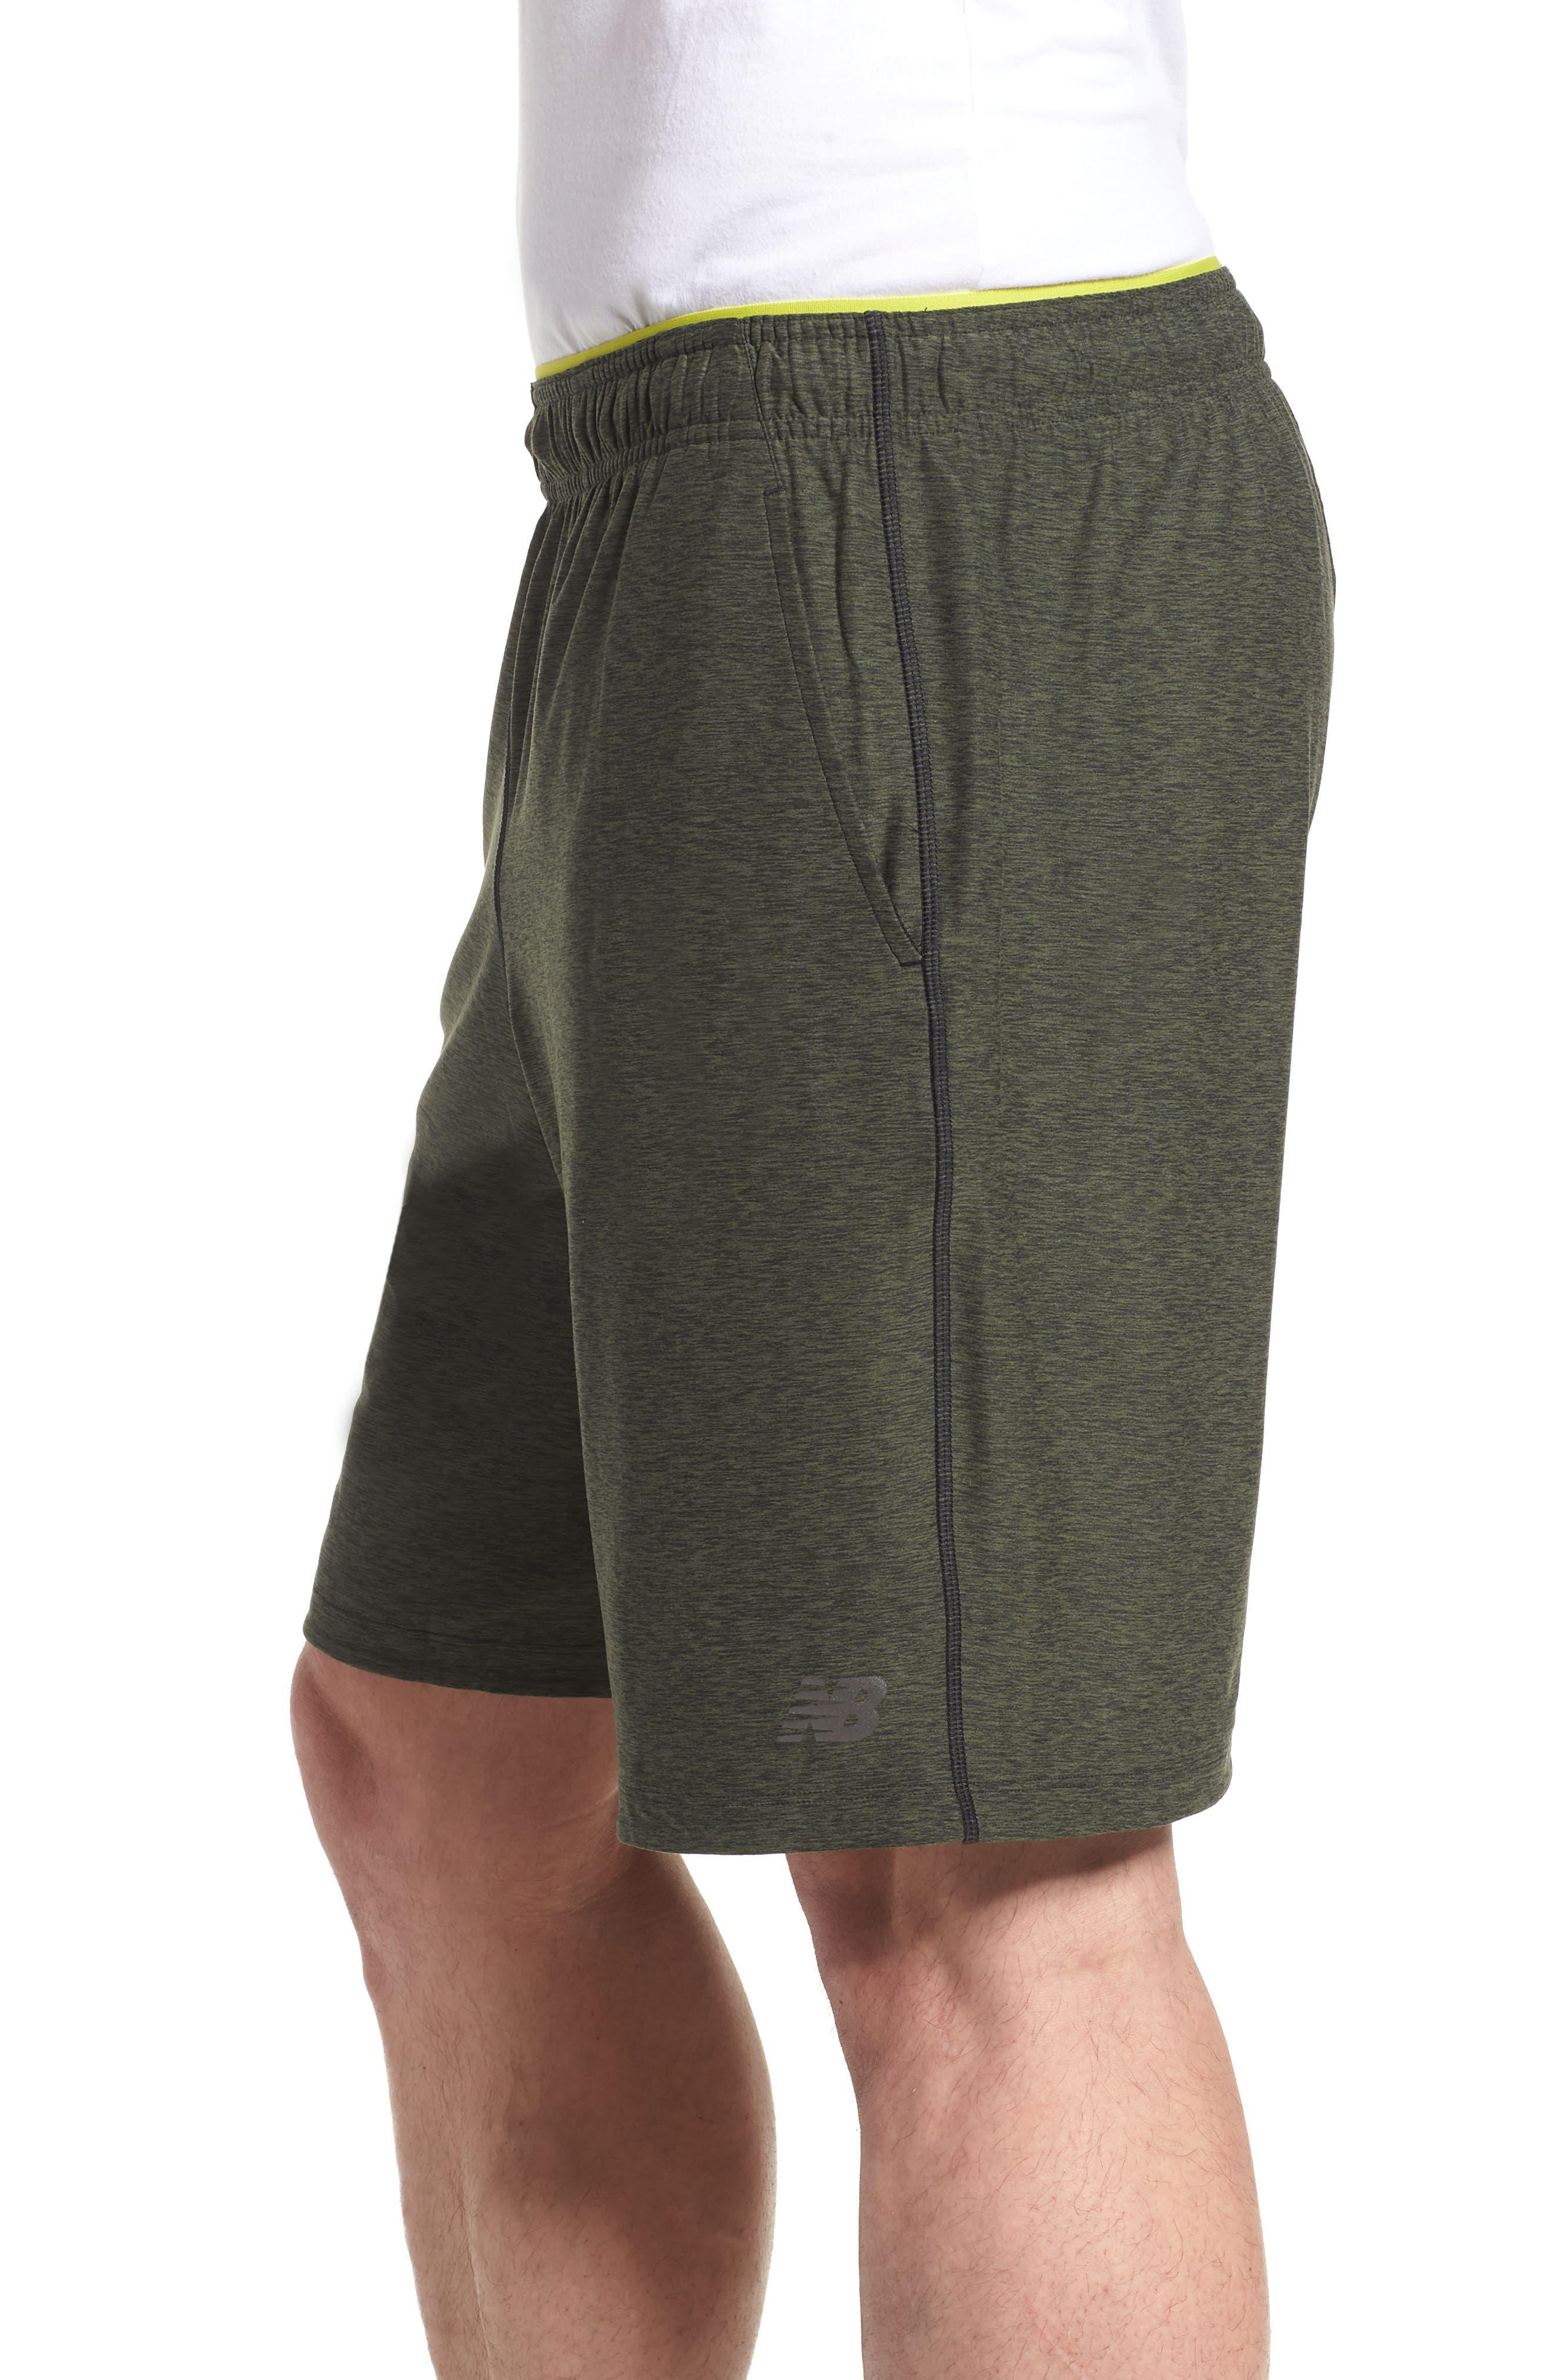 Anticipate Shorts,                             Alternate thumbnail 3, color,                             Dark Covert Green